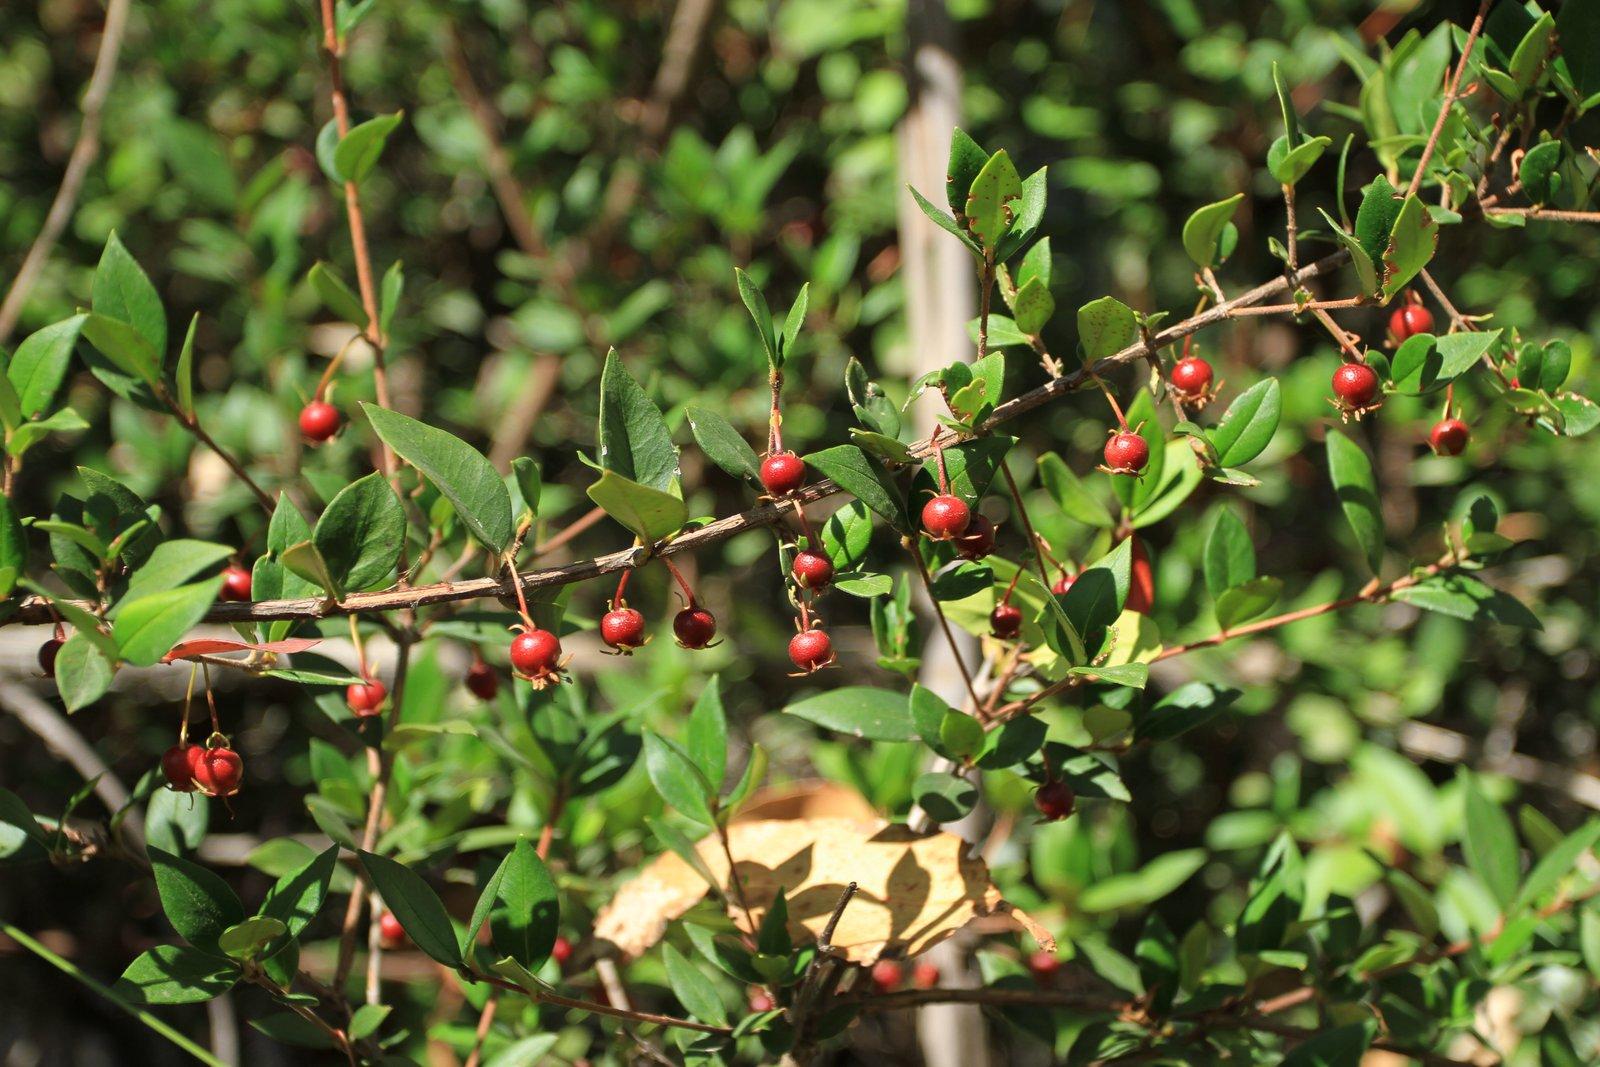 Murta berries in the wild from Rishi sourcing trip. Credit: Rishi